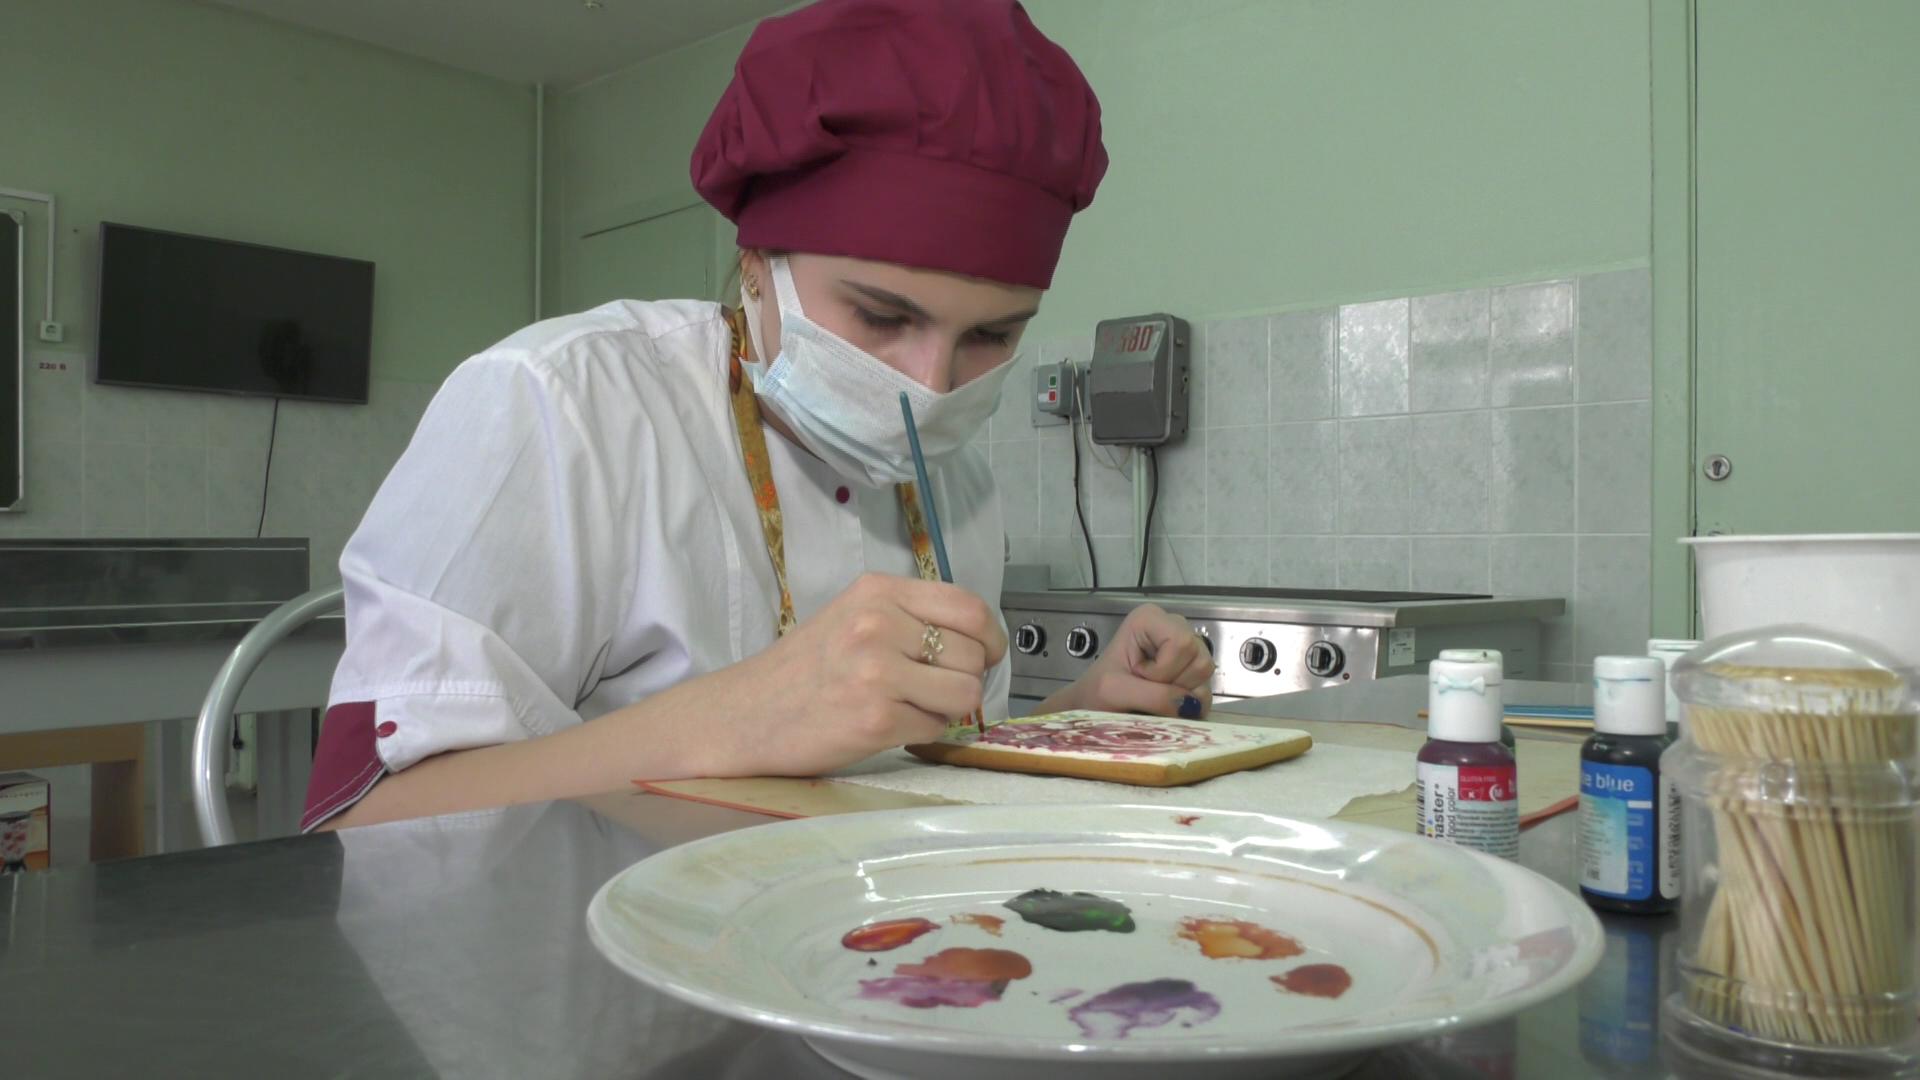 kulinary - Витебские кондитеры собрали коллекцию наград на «Продэкспо-2020» (видео)